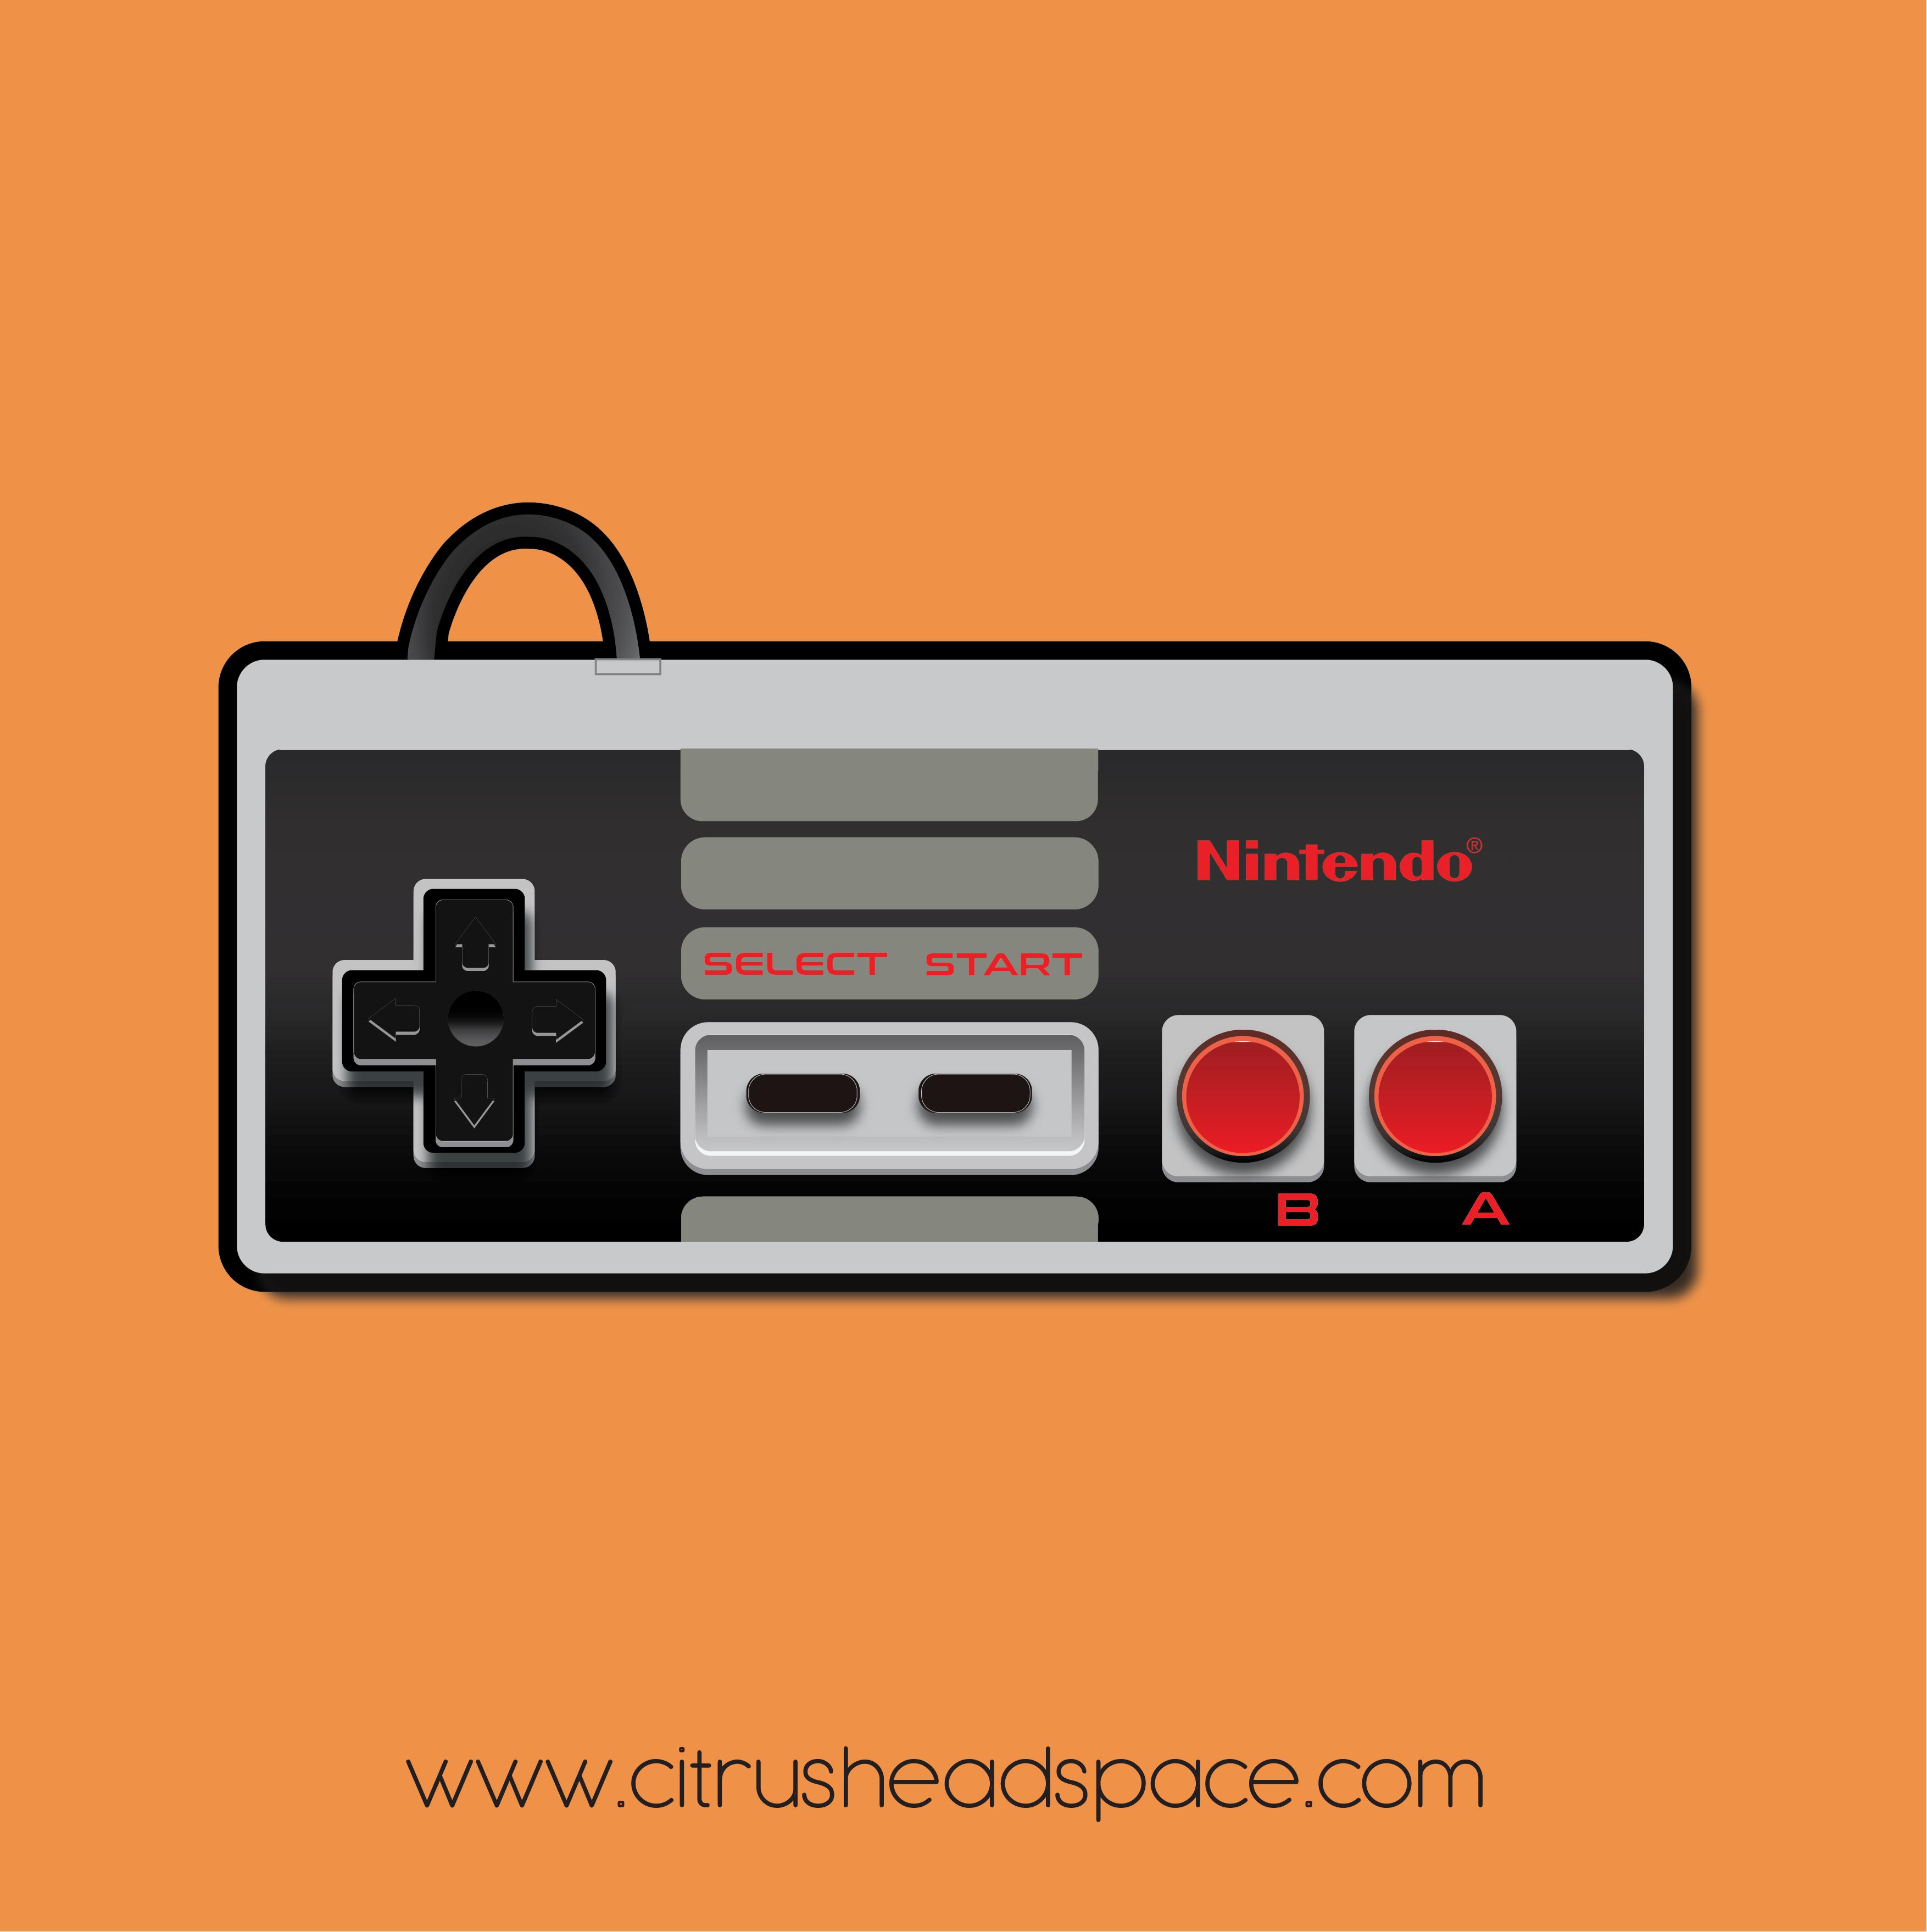 Nintendo Entertainment System Controller Personajes De Marvel Fondos De Pantalla De Bloqueo Marvel